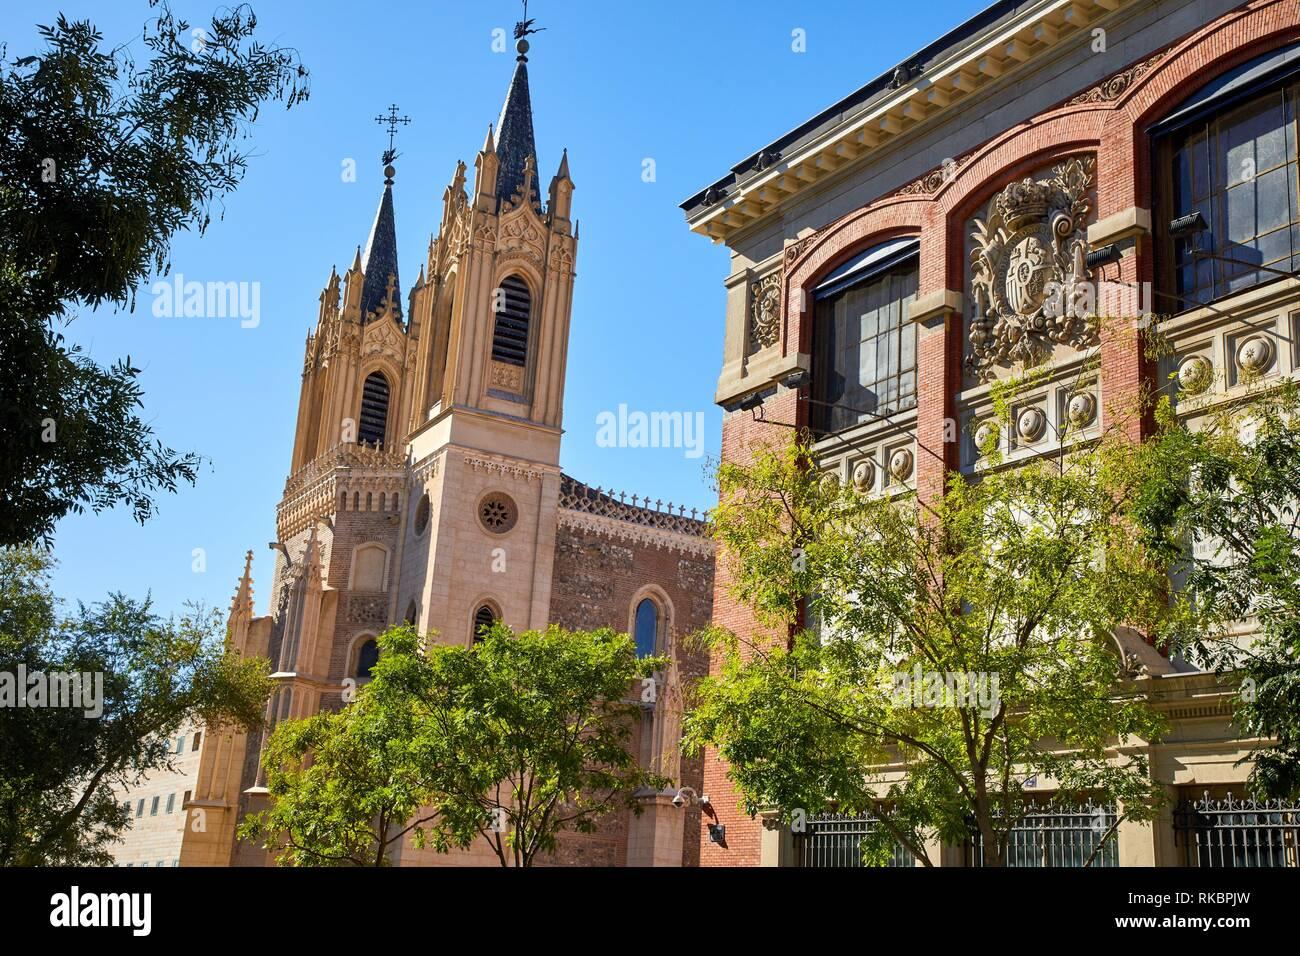 Real Academia Española building, San Jerónimo el Real, Moreto street, Madrid, Spain, Europe - Stock Image